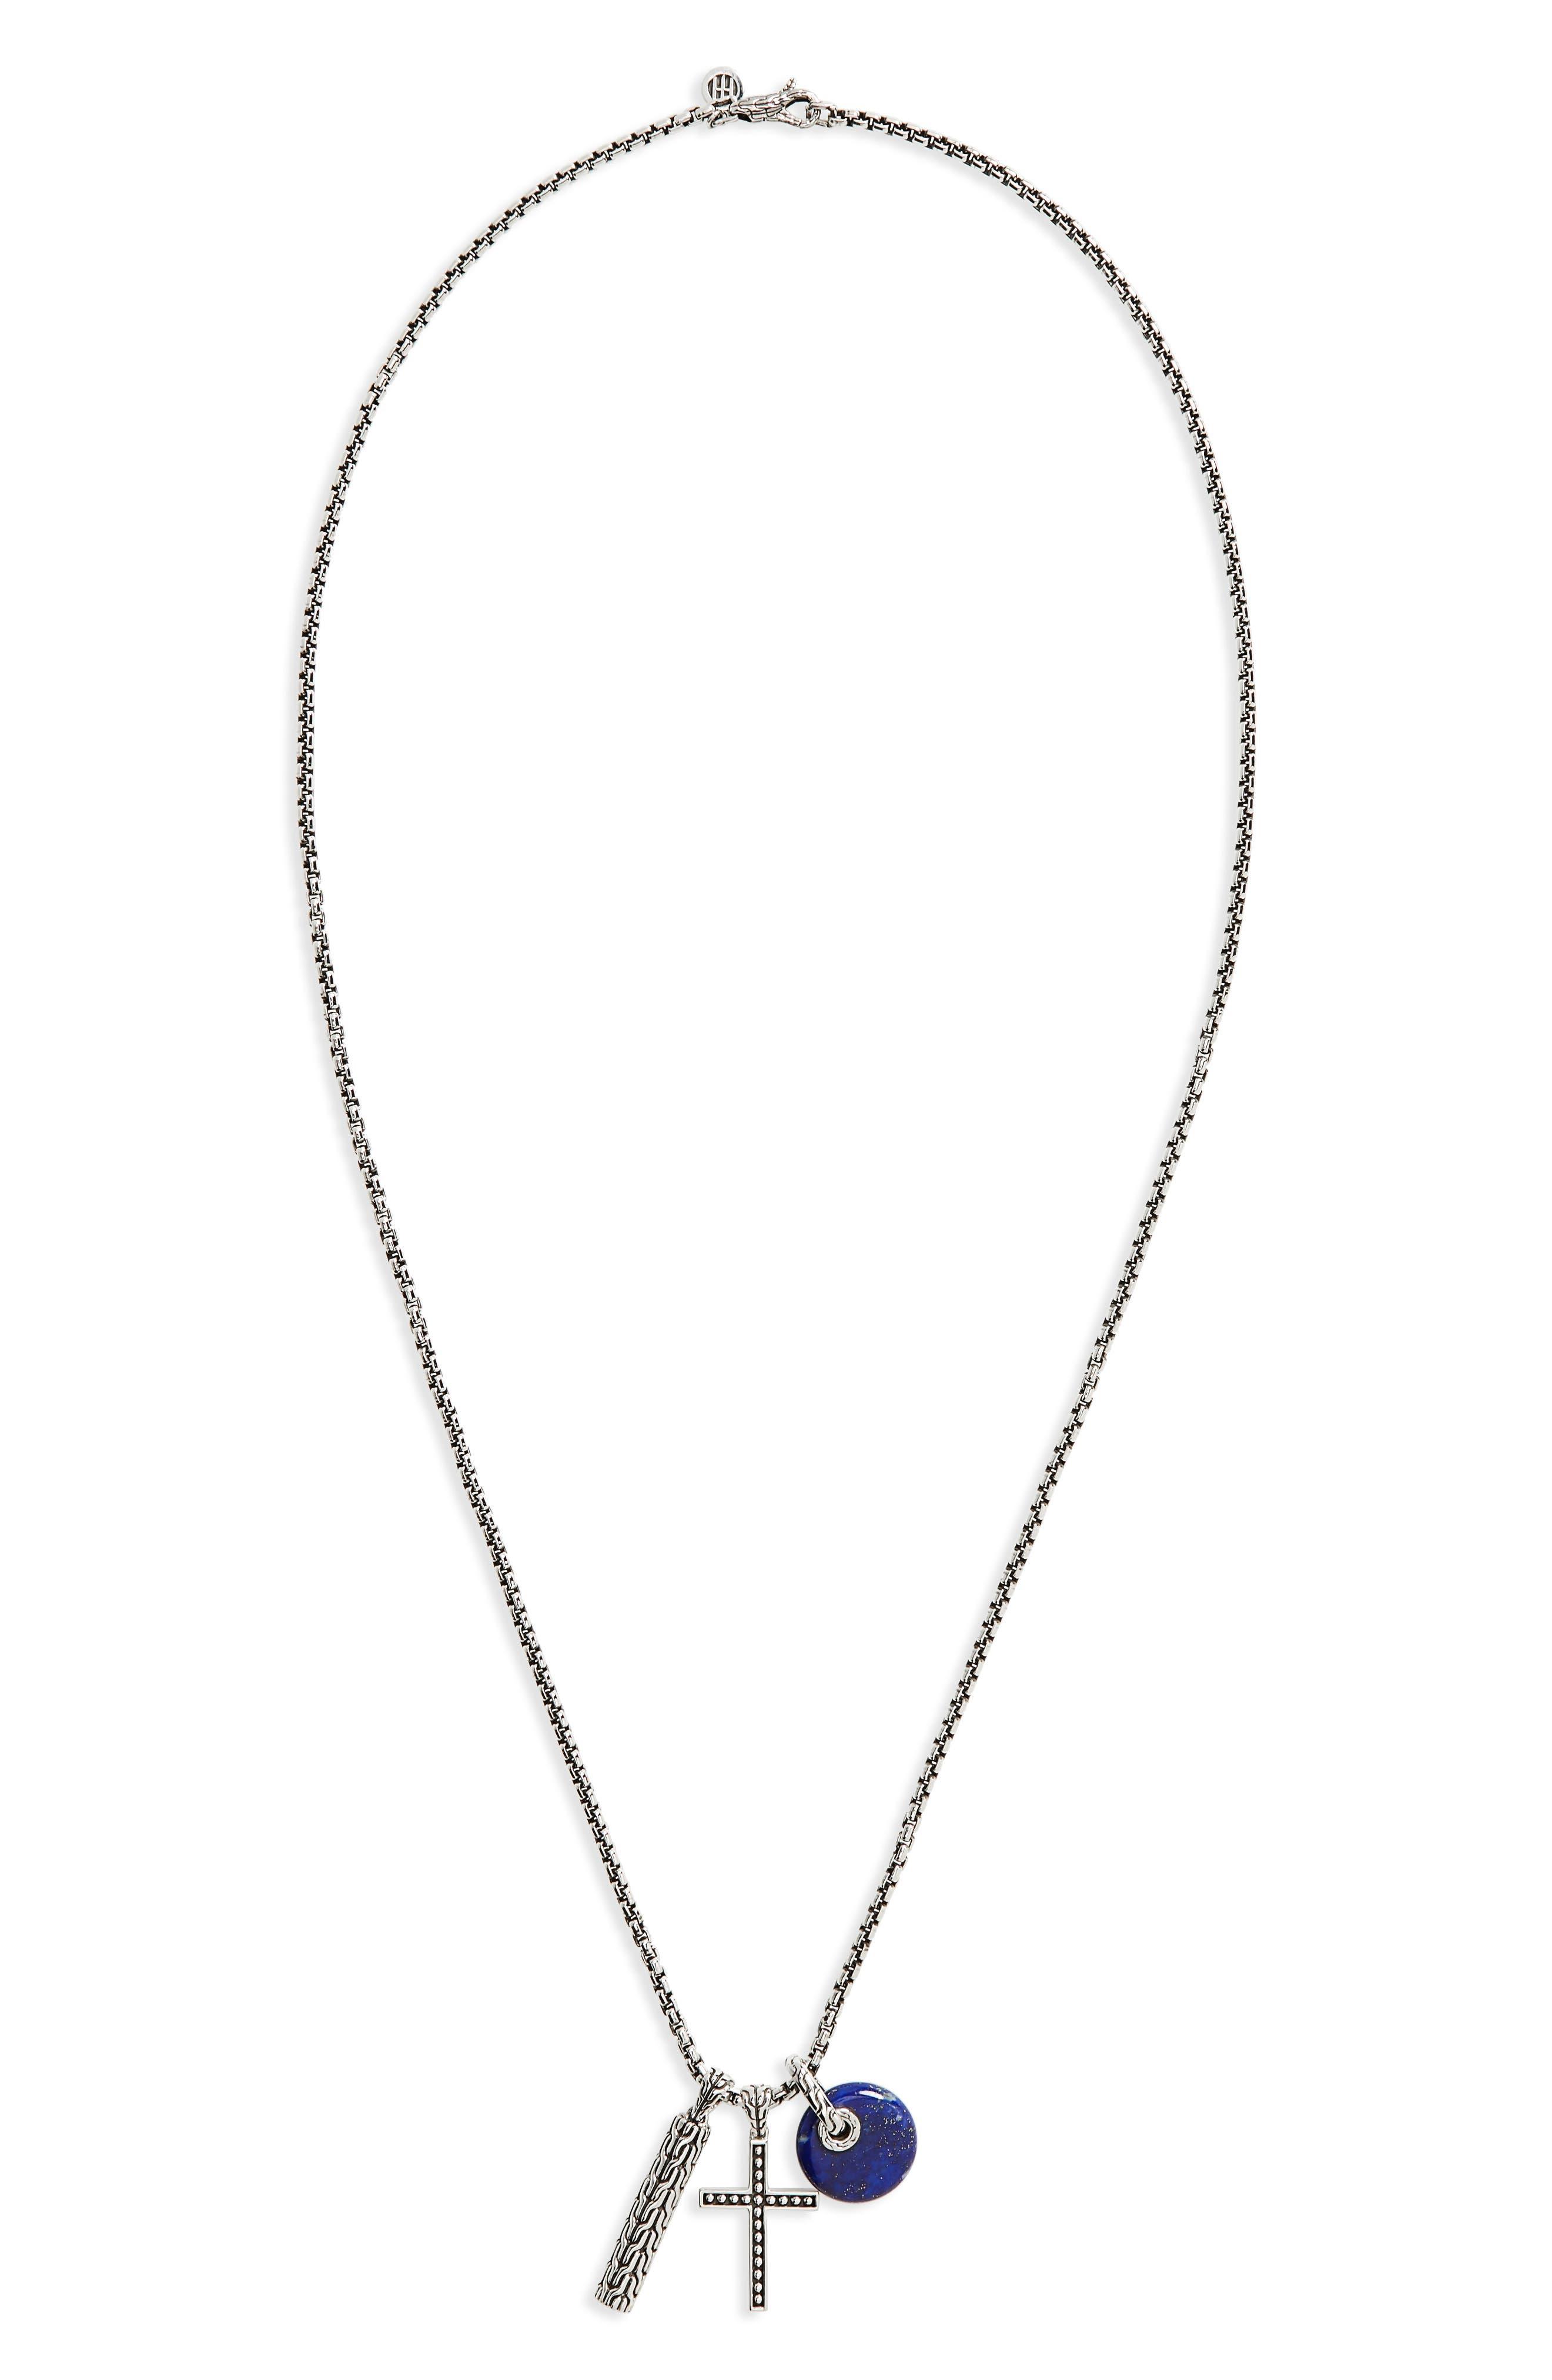 Jawan Charm Pendant Necklace,                         Main,                         color, Silver/ Lapis Lazuli